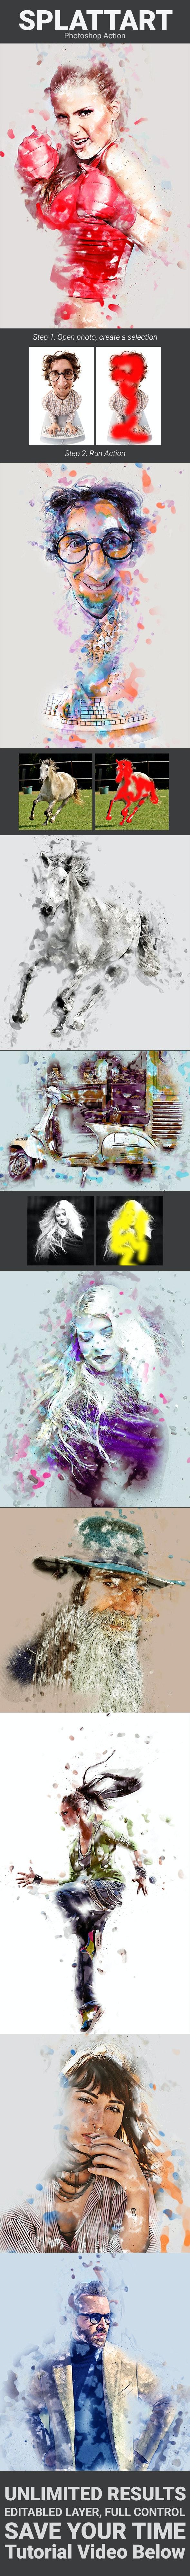 Splattart - Photo Effects Actions